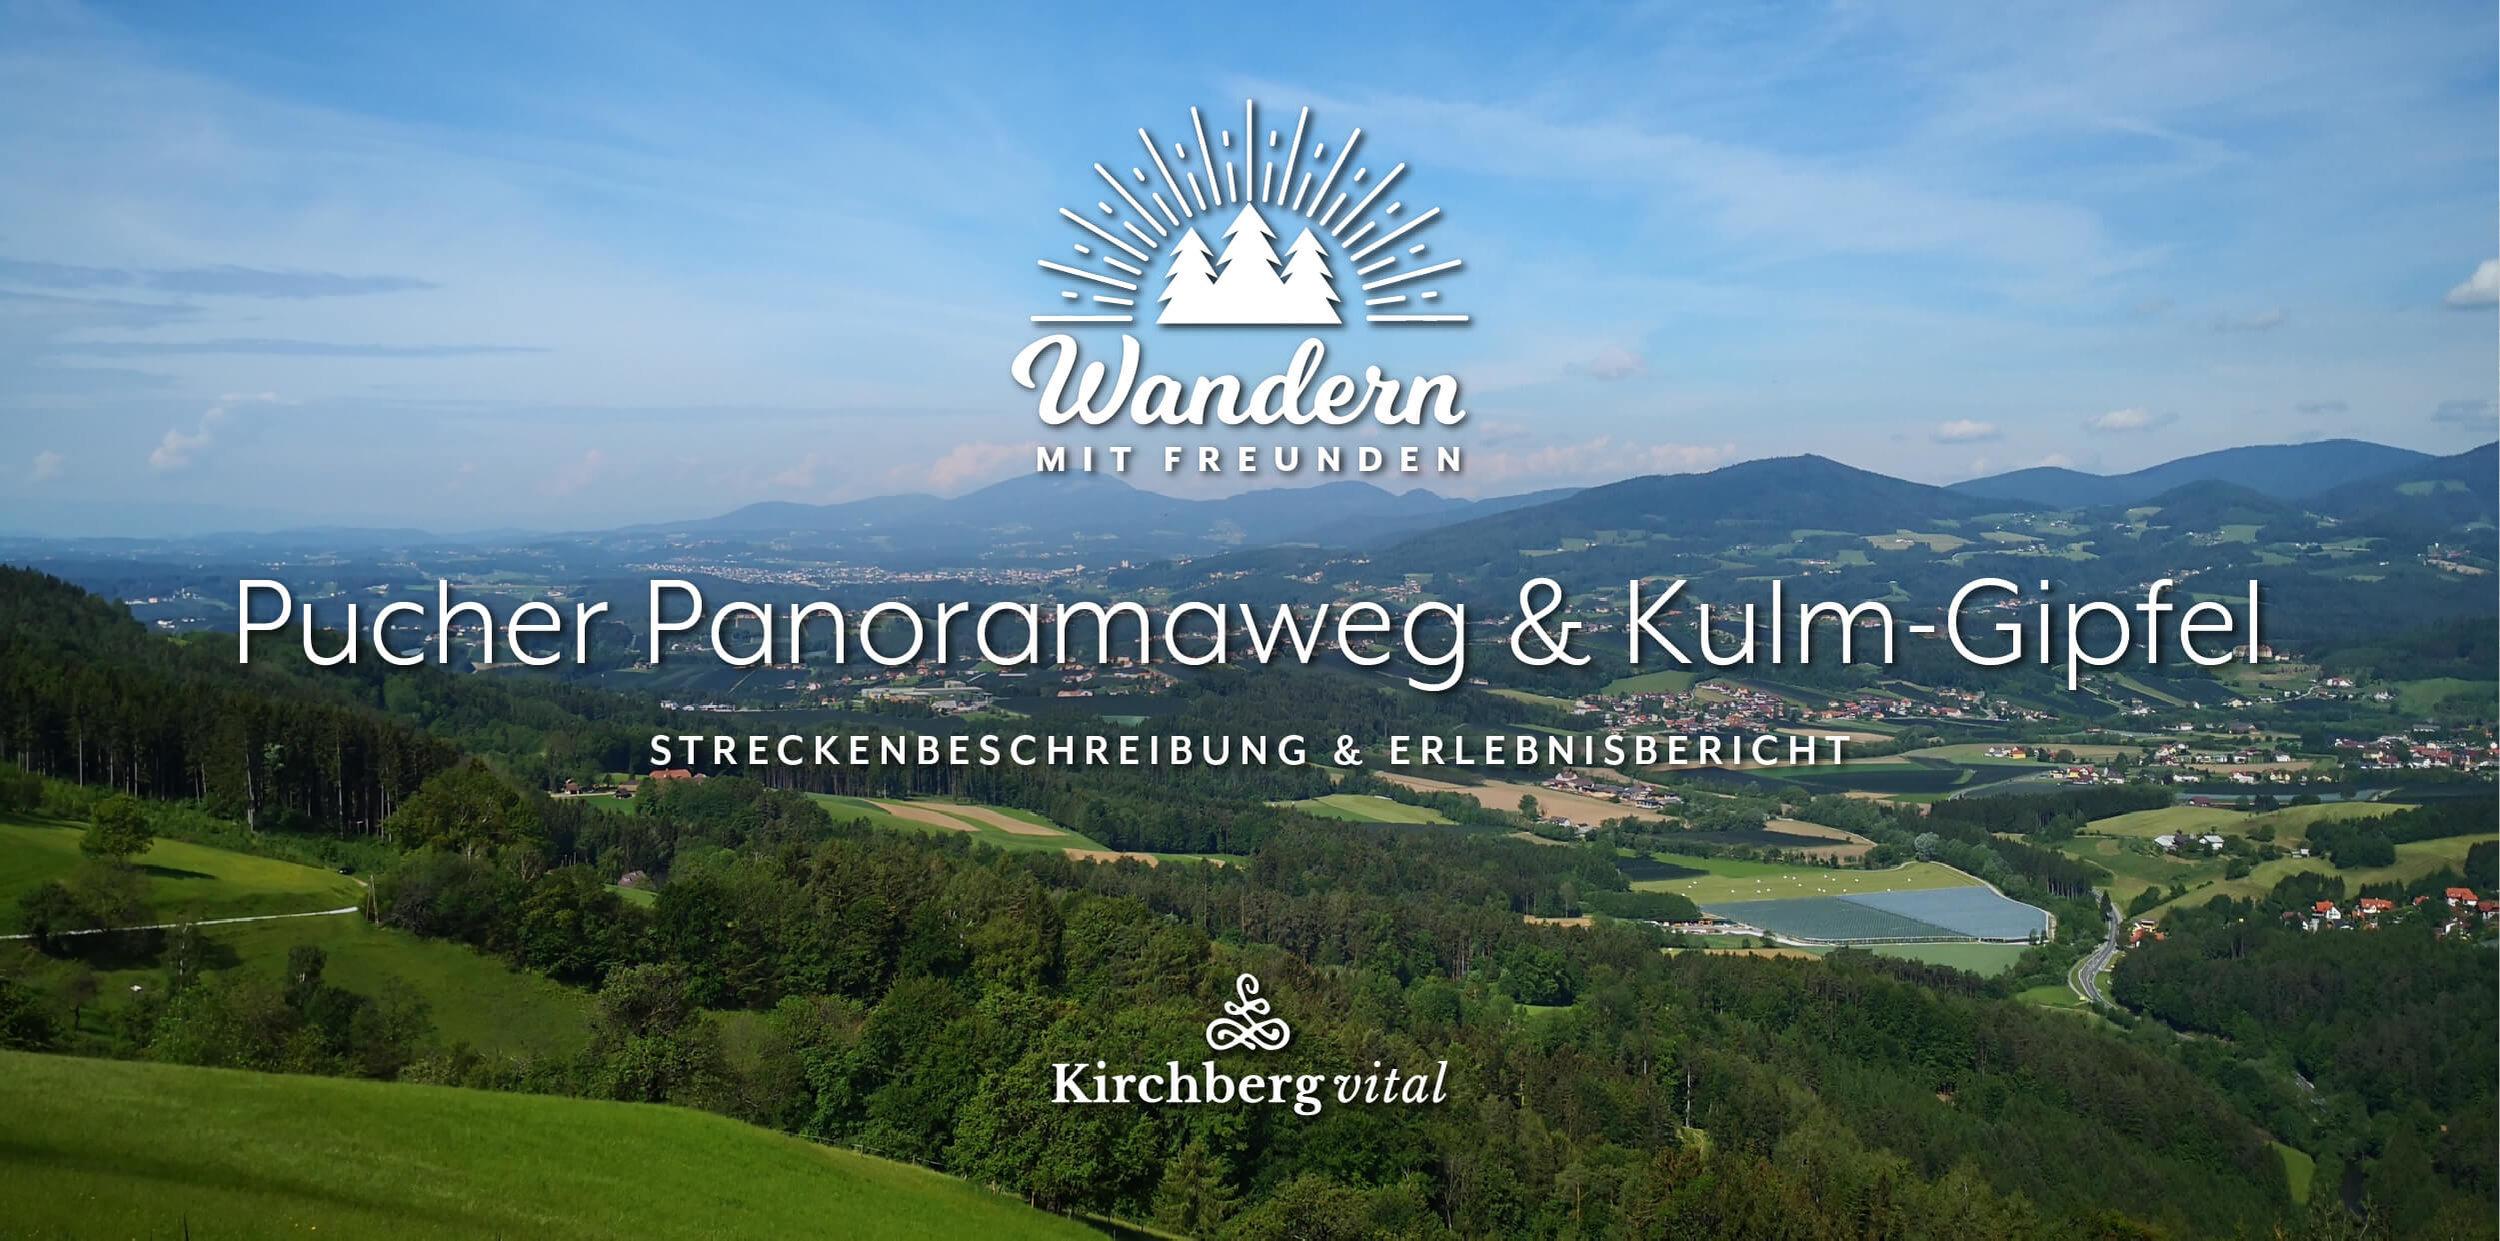 Pucher-Panoramaweg-M_BLOG-BANNER.jpg